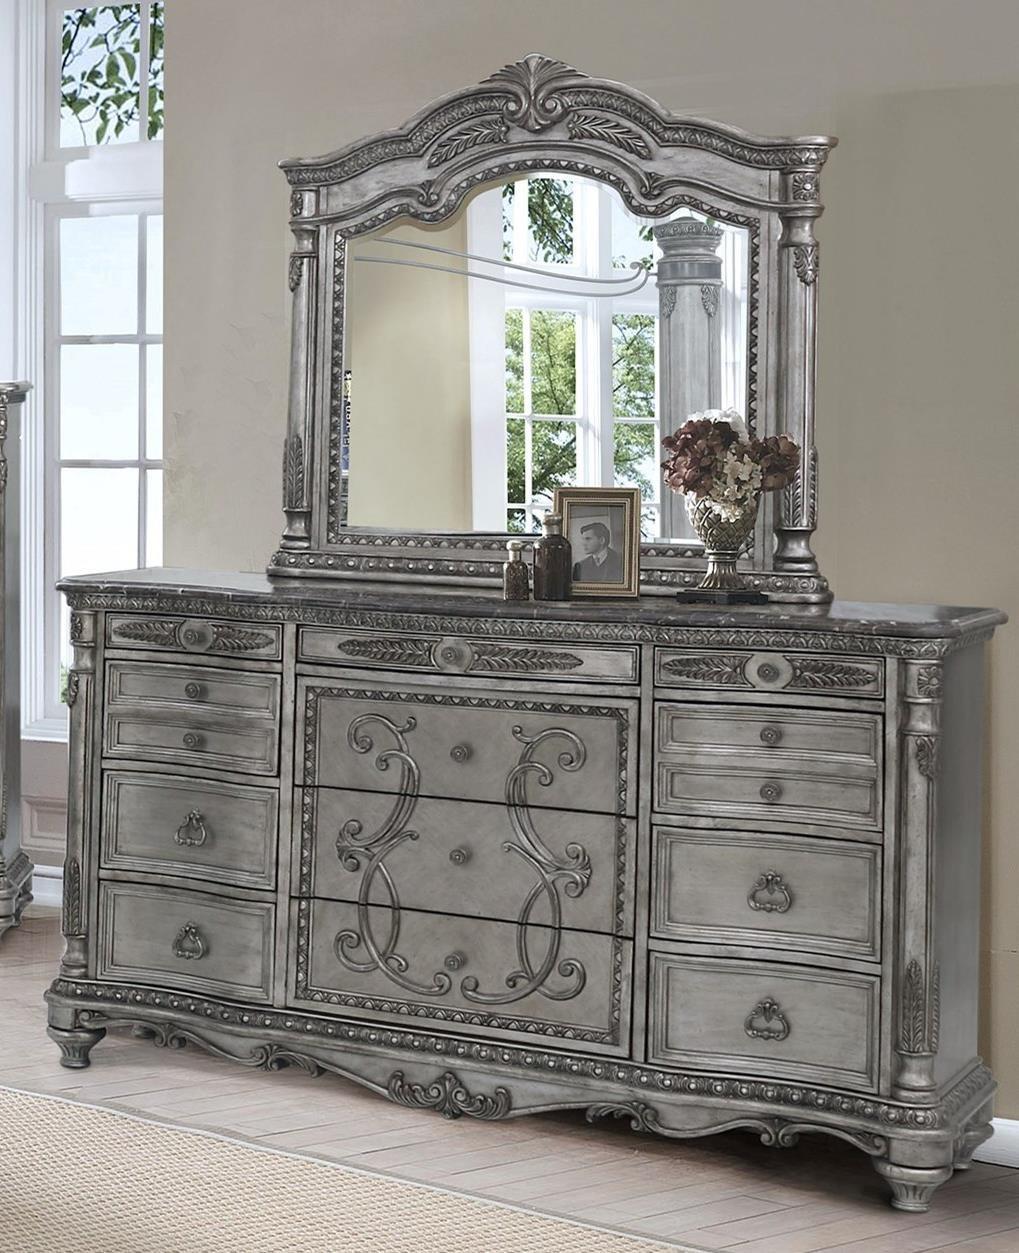 Antique Platinum Dresser and Mirror Set by Avalon Furniture at Wilcox Furniture